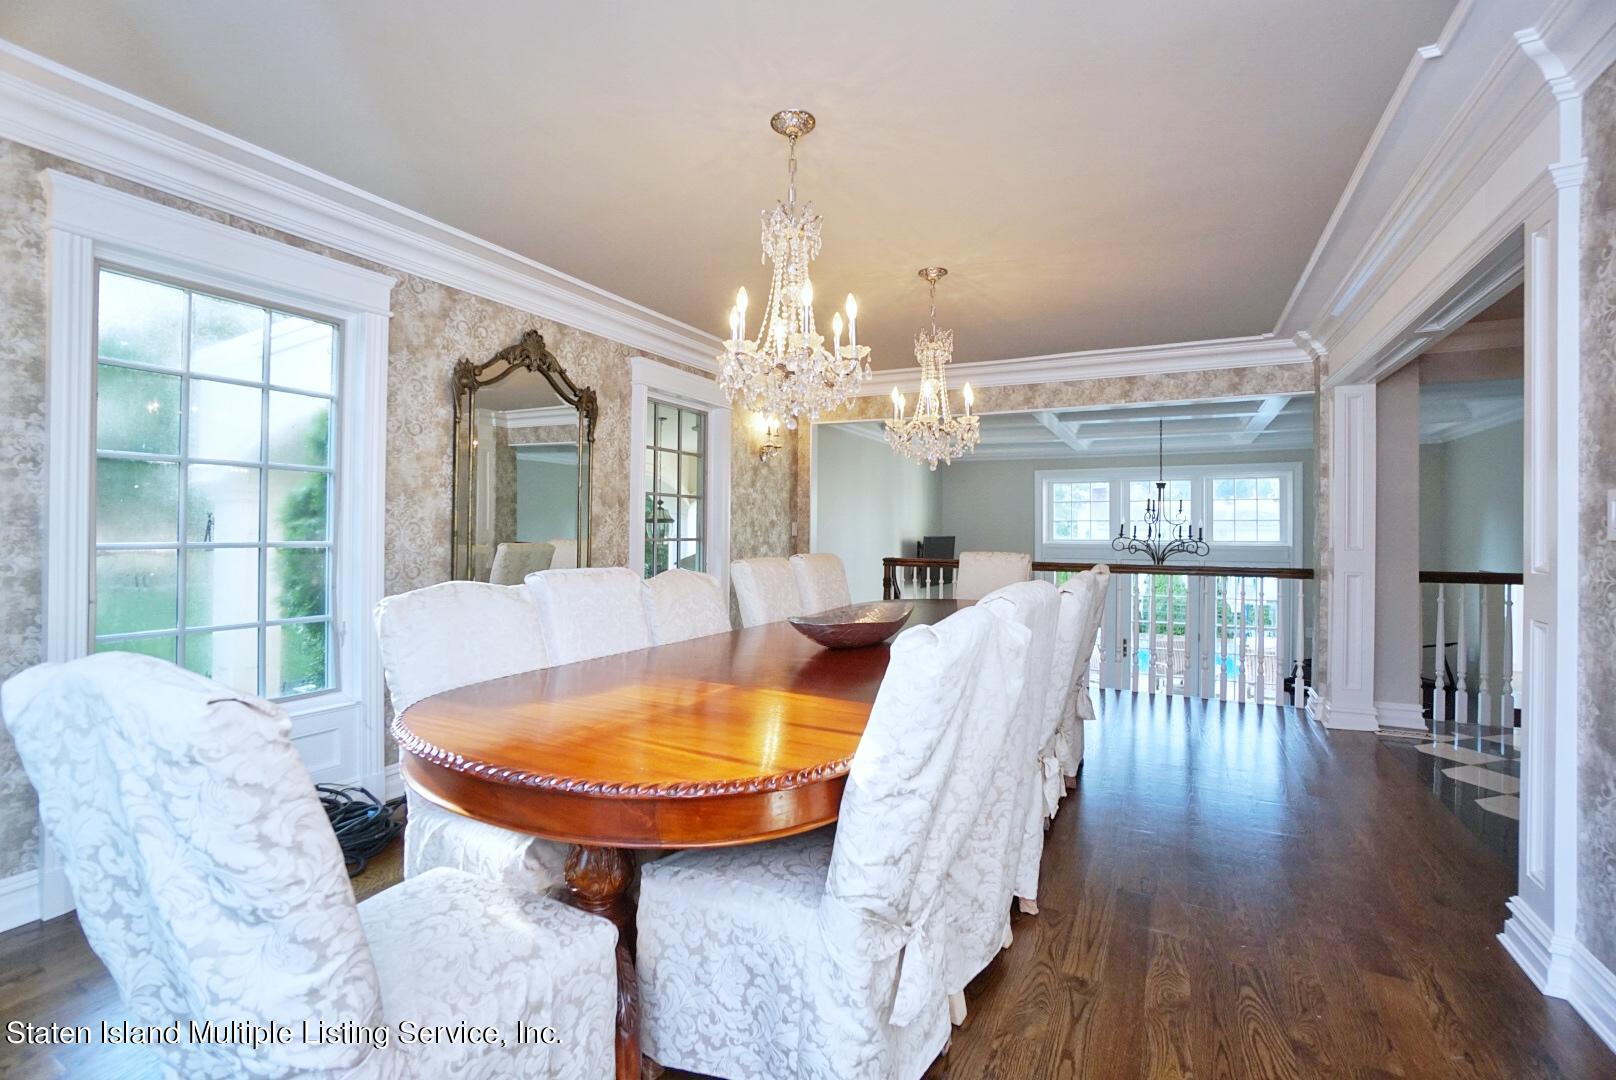 Single Family - Detached 116 Fine Blvd   Staten Island, NY 10314, MLS-1148291-11